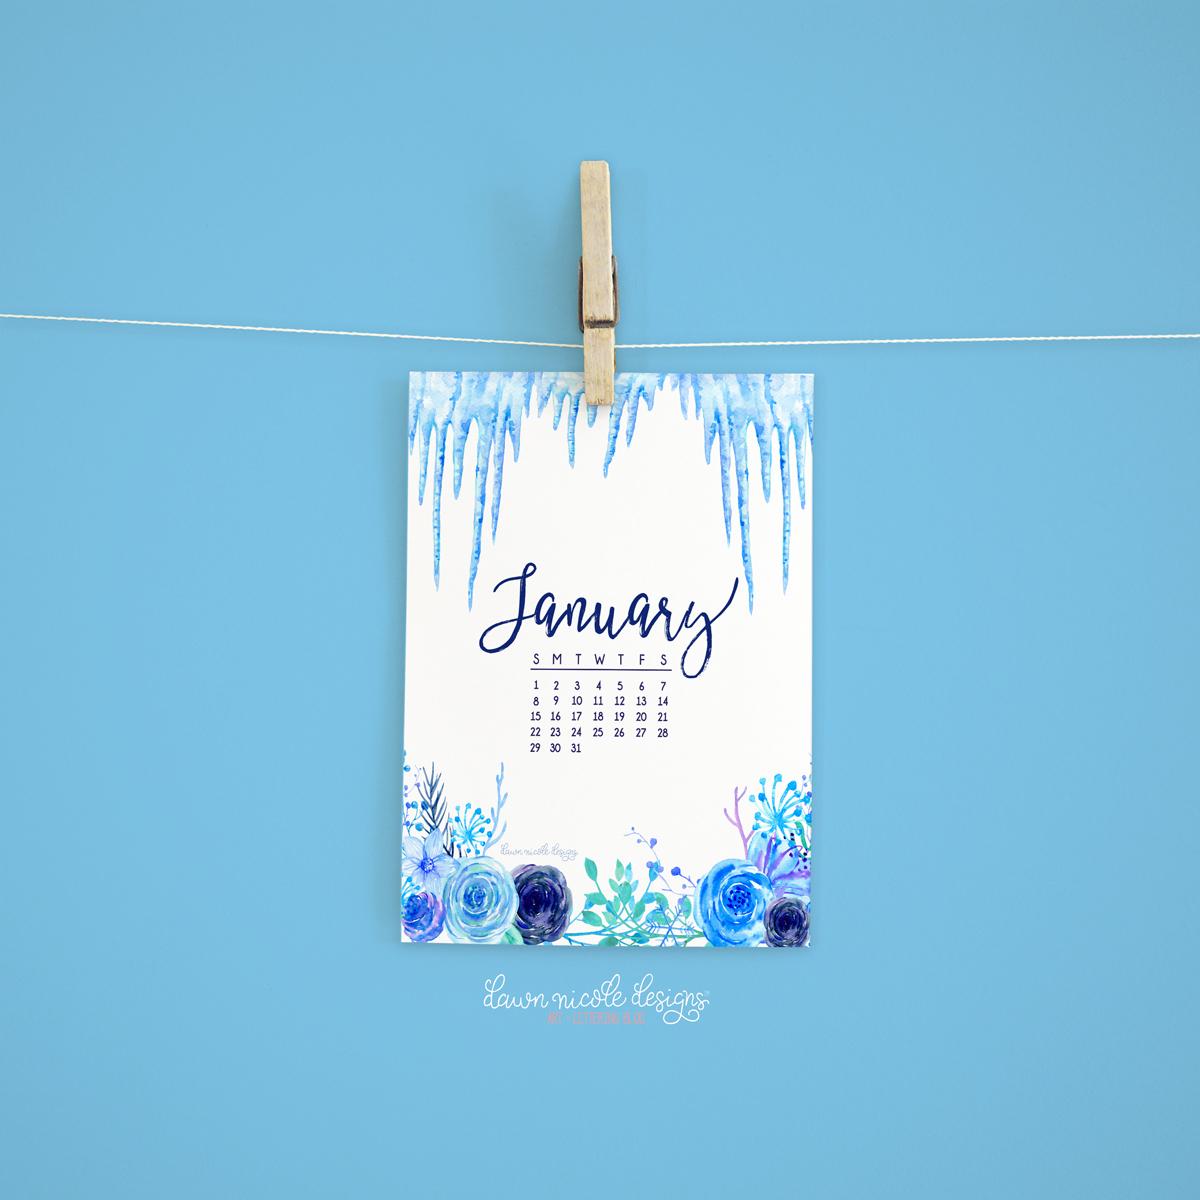 January 2017 Calendar Tech Pretties Dawn Nicole Designs 1200x1200